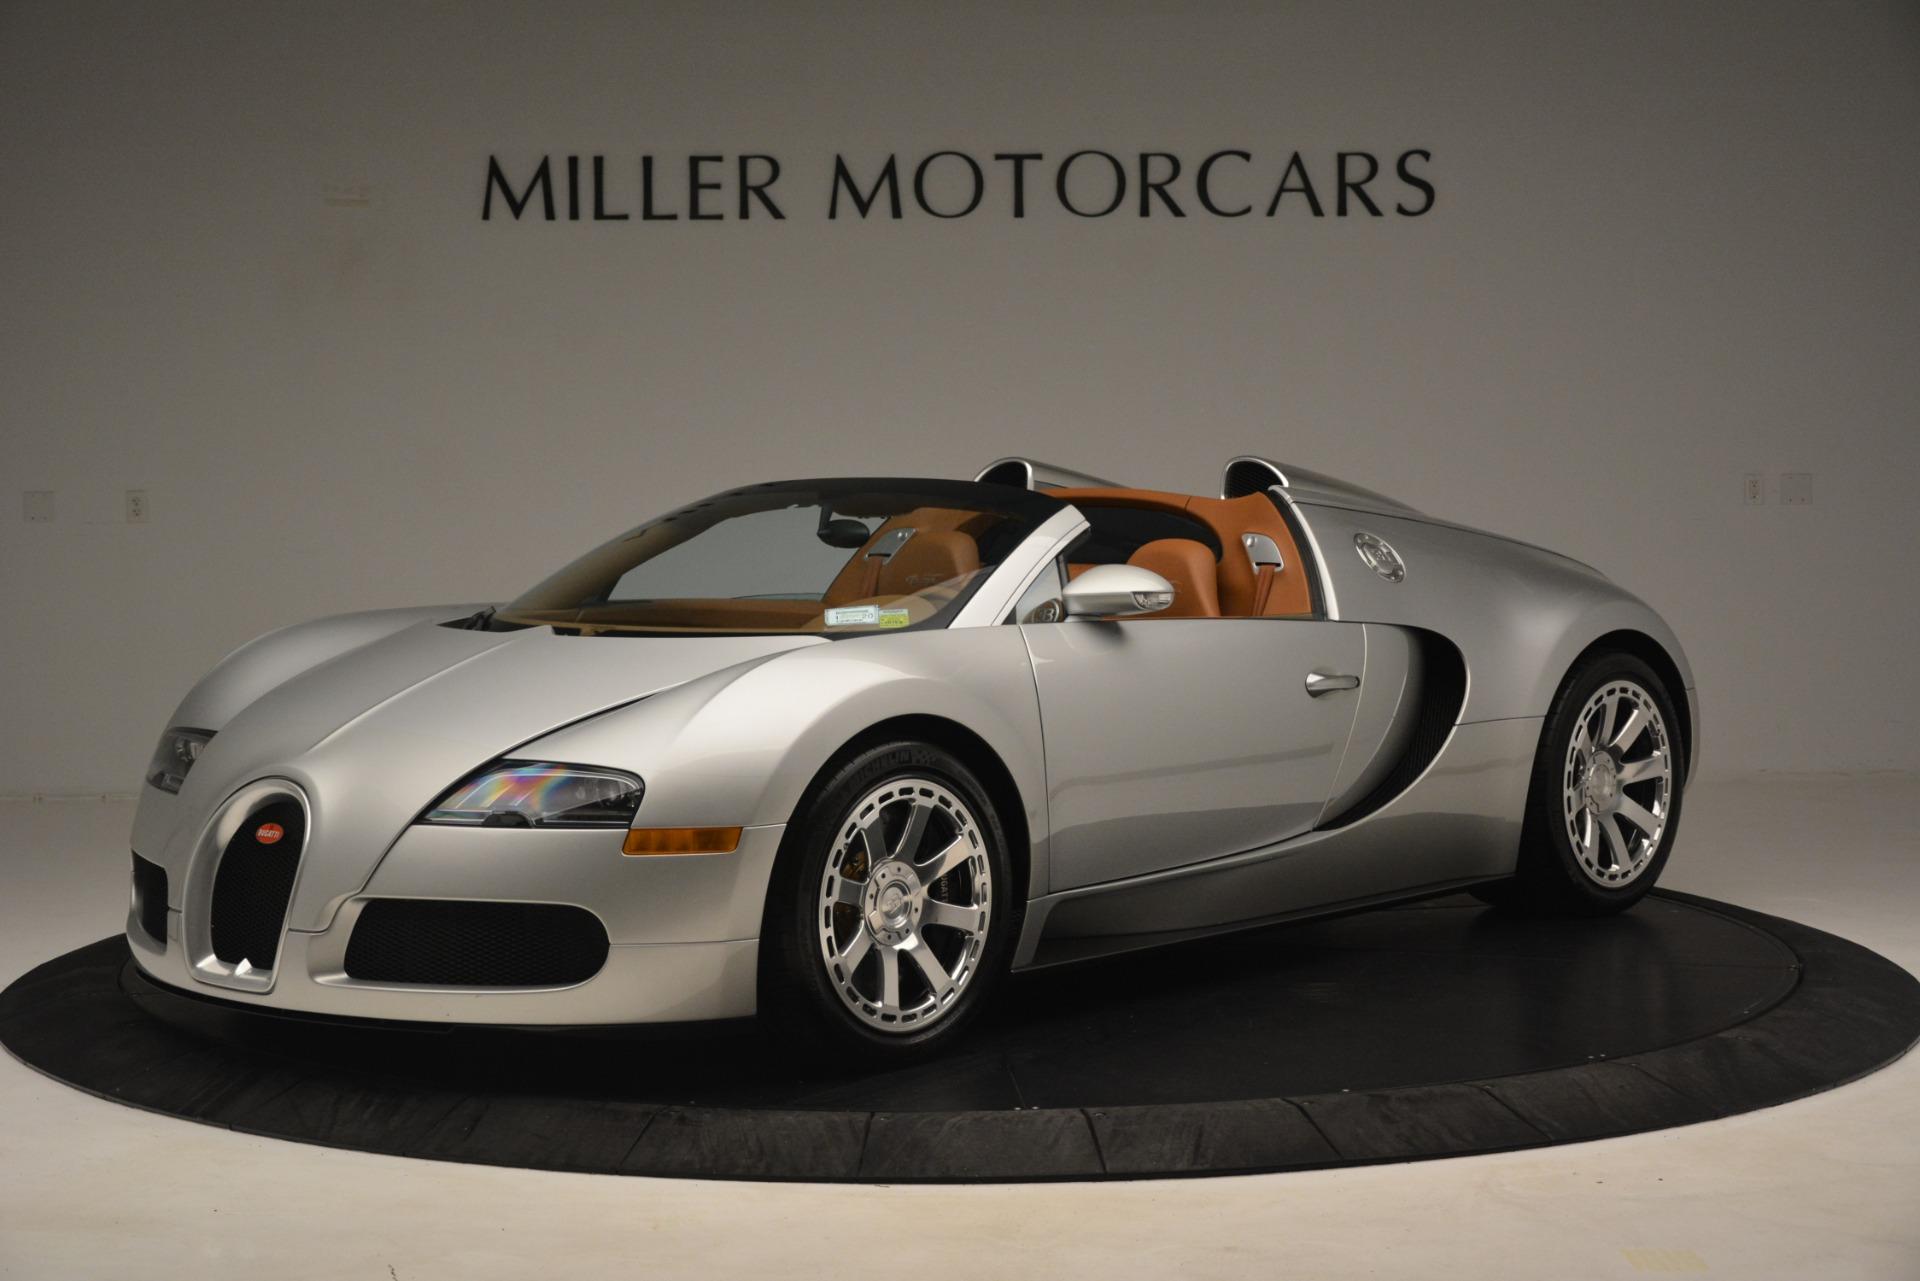 Used 2010 Bugatti Veyron 16.4 Grand Sport For Sale In Greenwich, CT 3159_p2